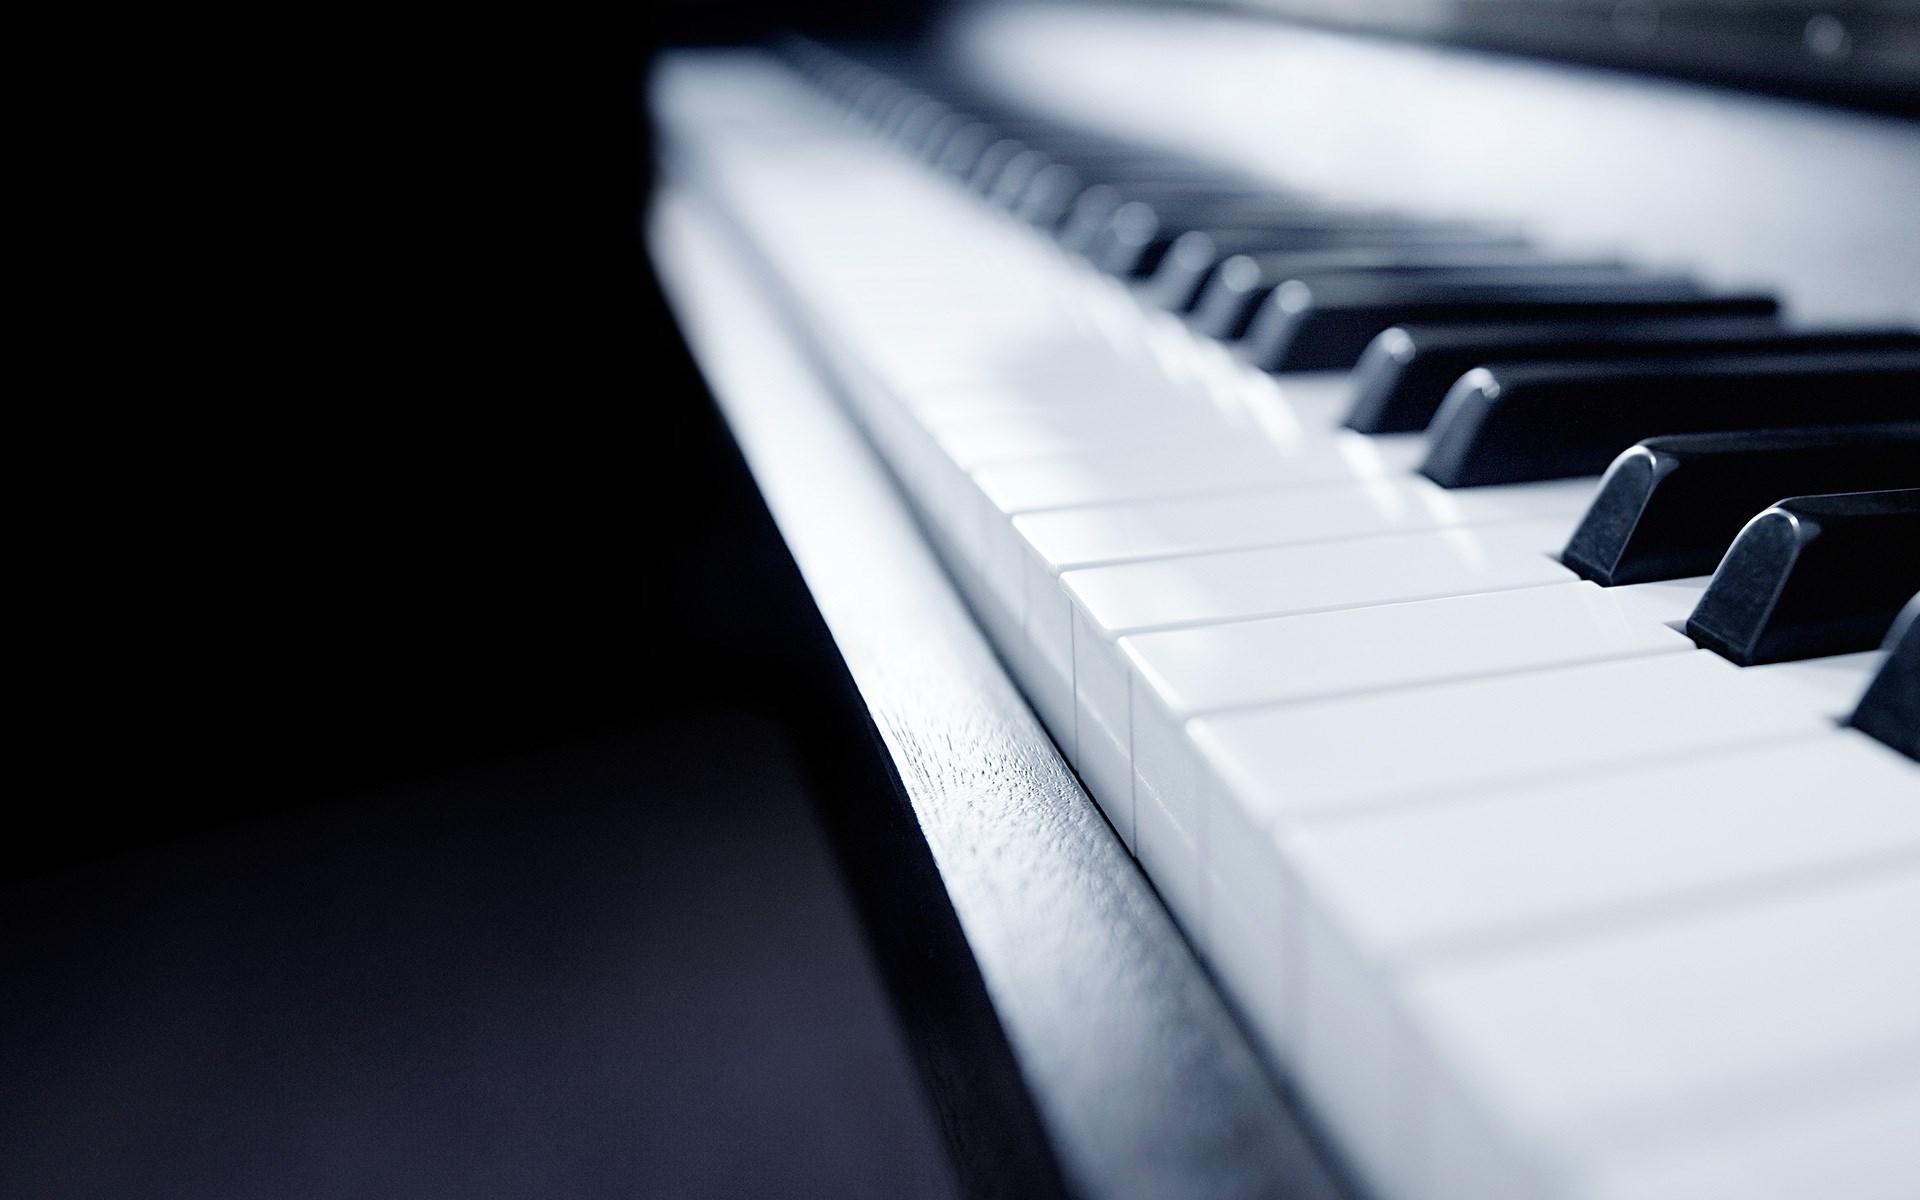 Piano Close-Up Photo Music